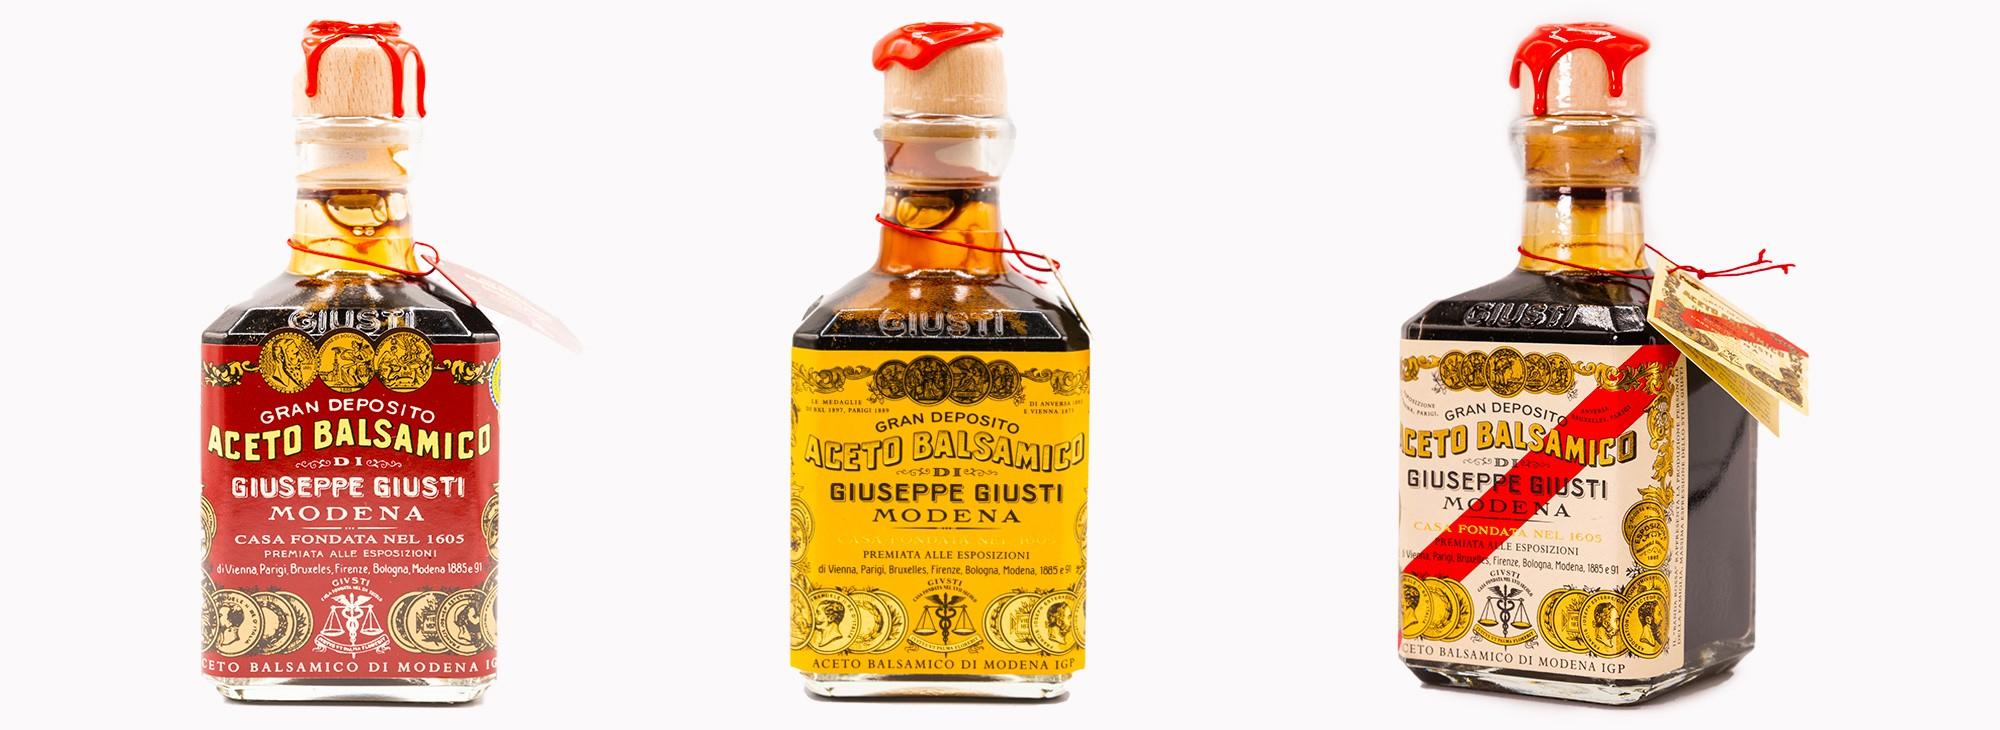 Exceptional balsamic vinegar